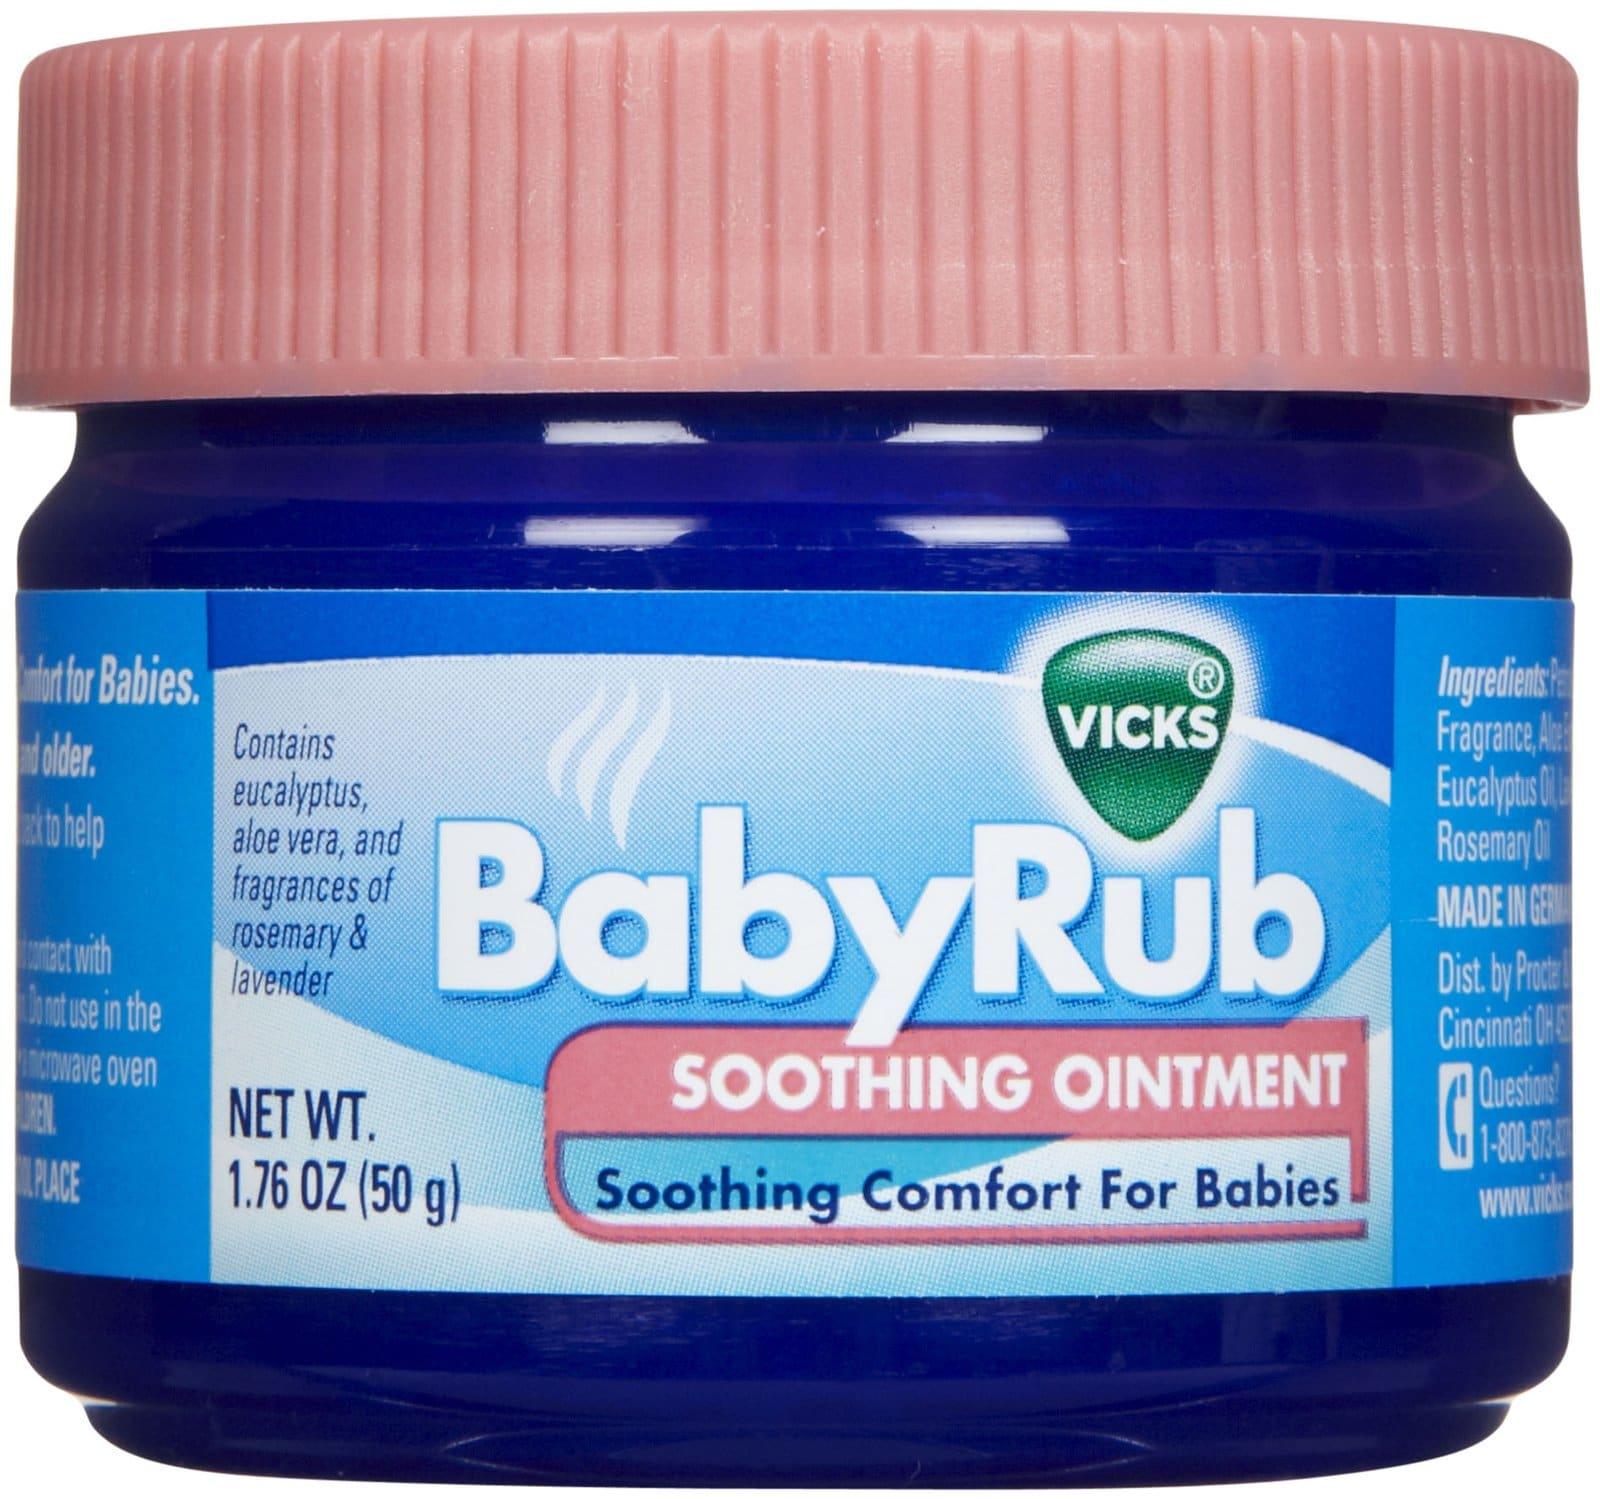 Vicks Babyrub Soothing Ointment 50g Importado